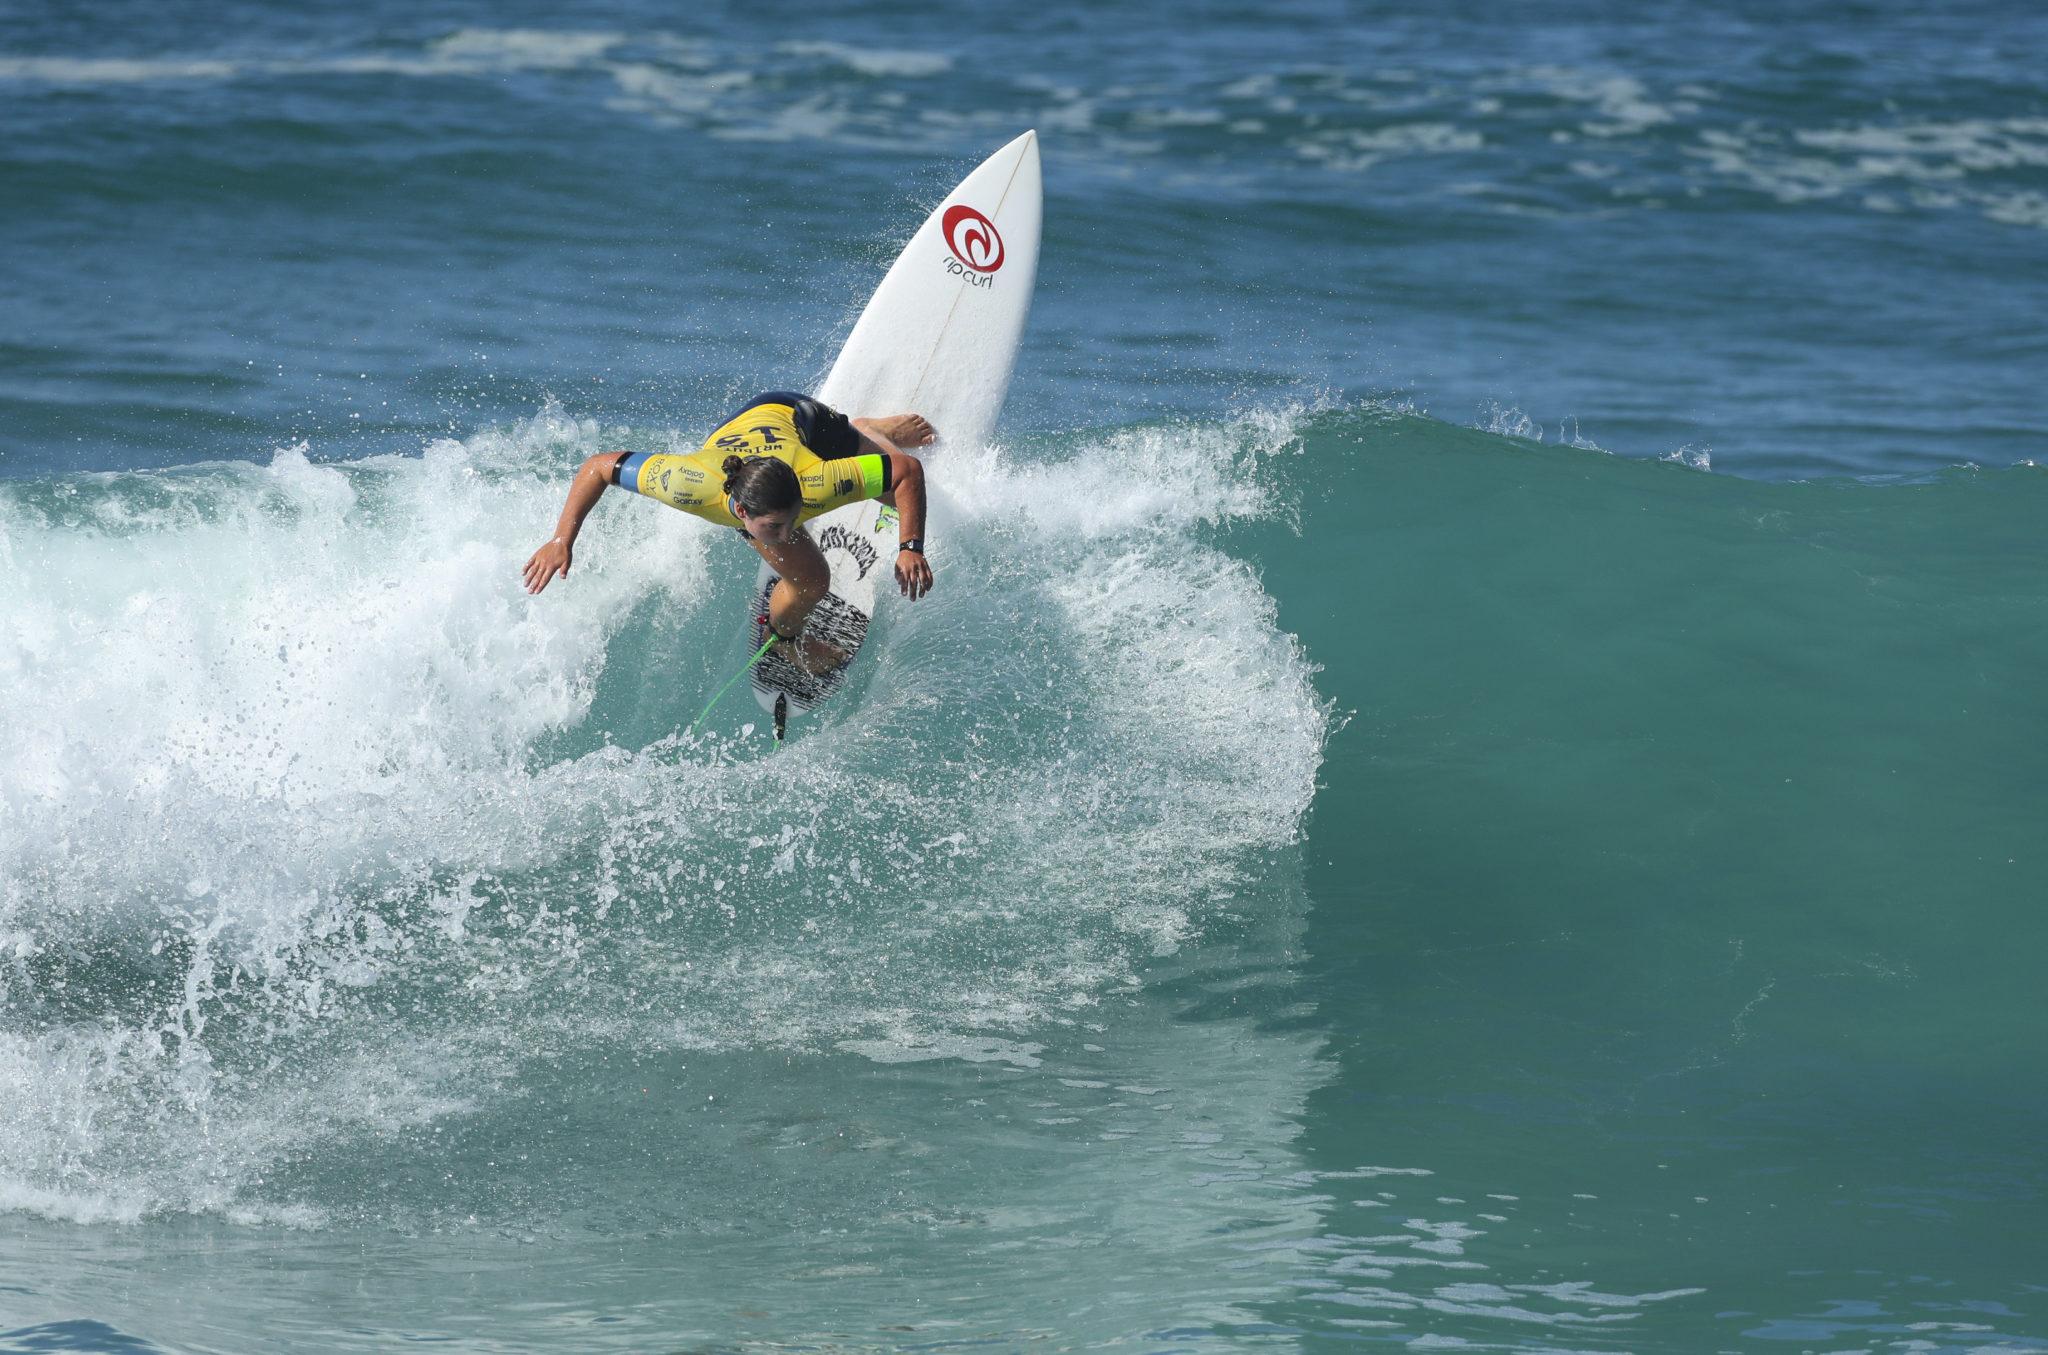 Tyler Wright (AUS) / Foto Poullenot